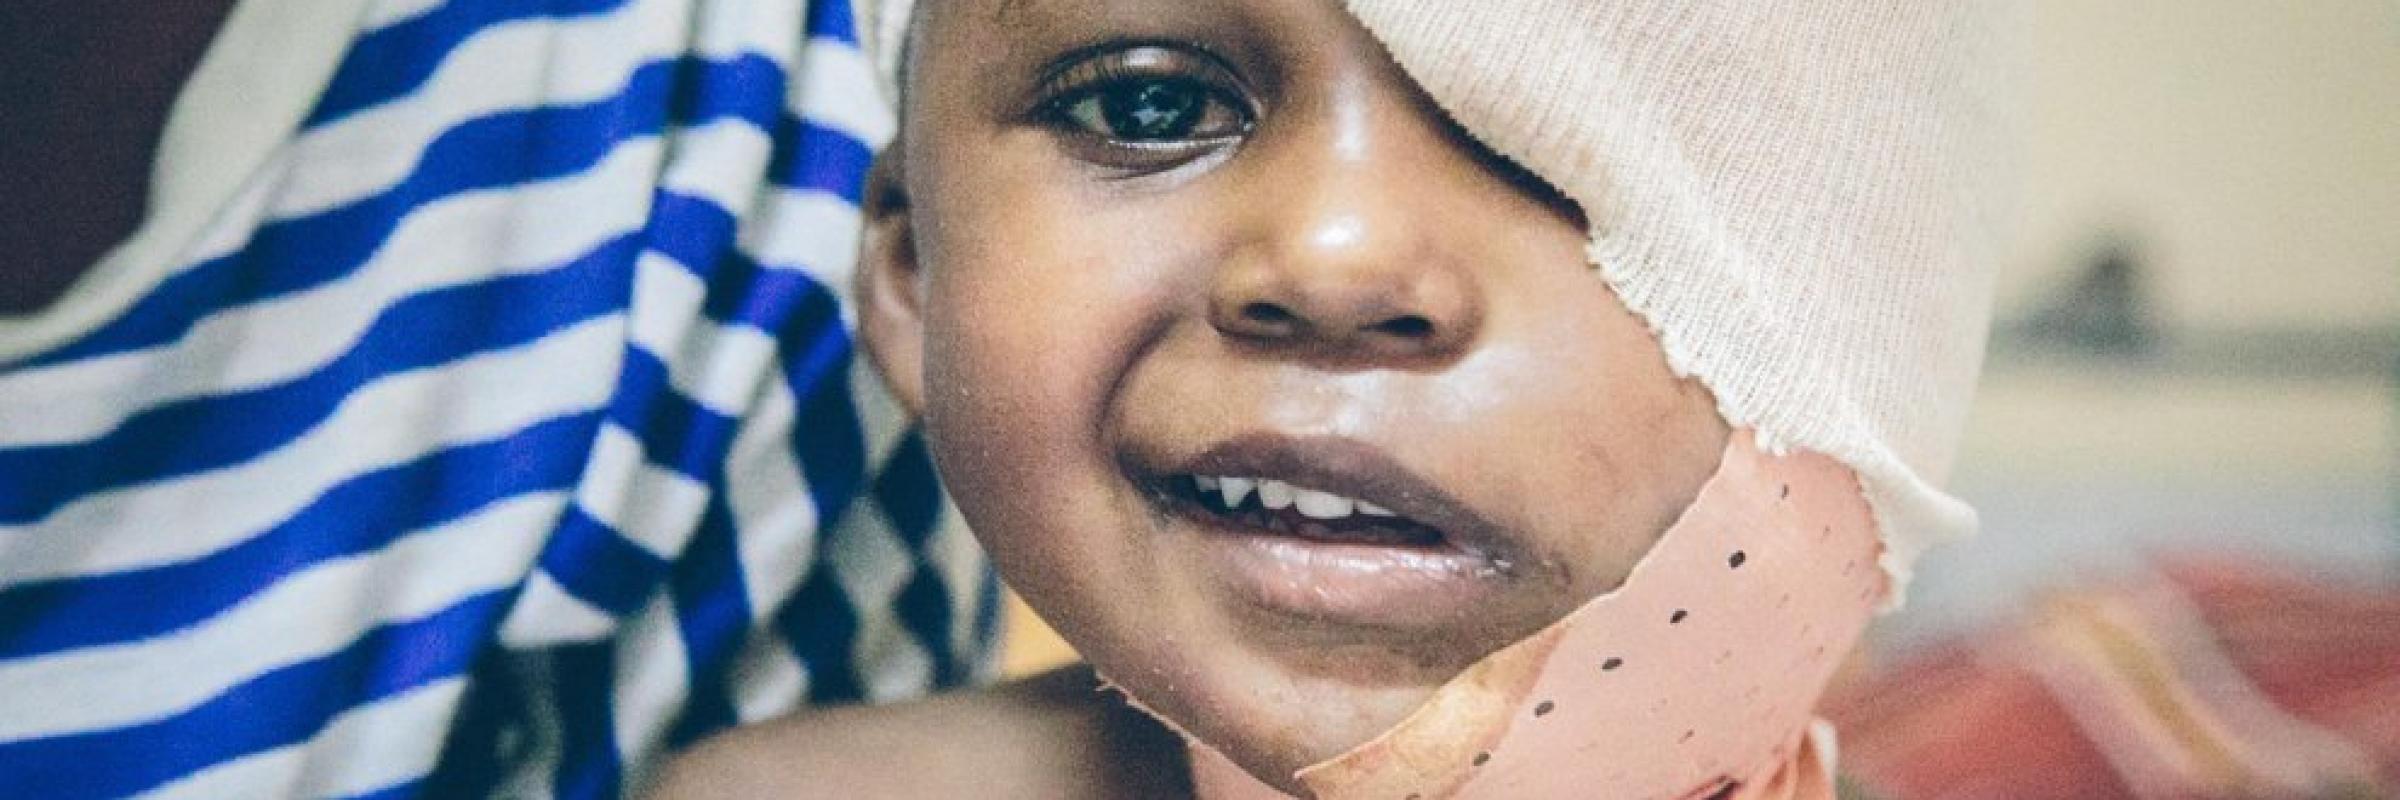 HEAL Africa moise salivary gland tumor